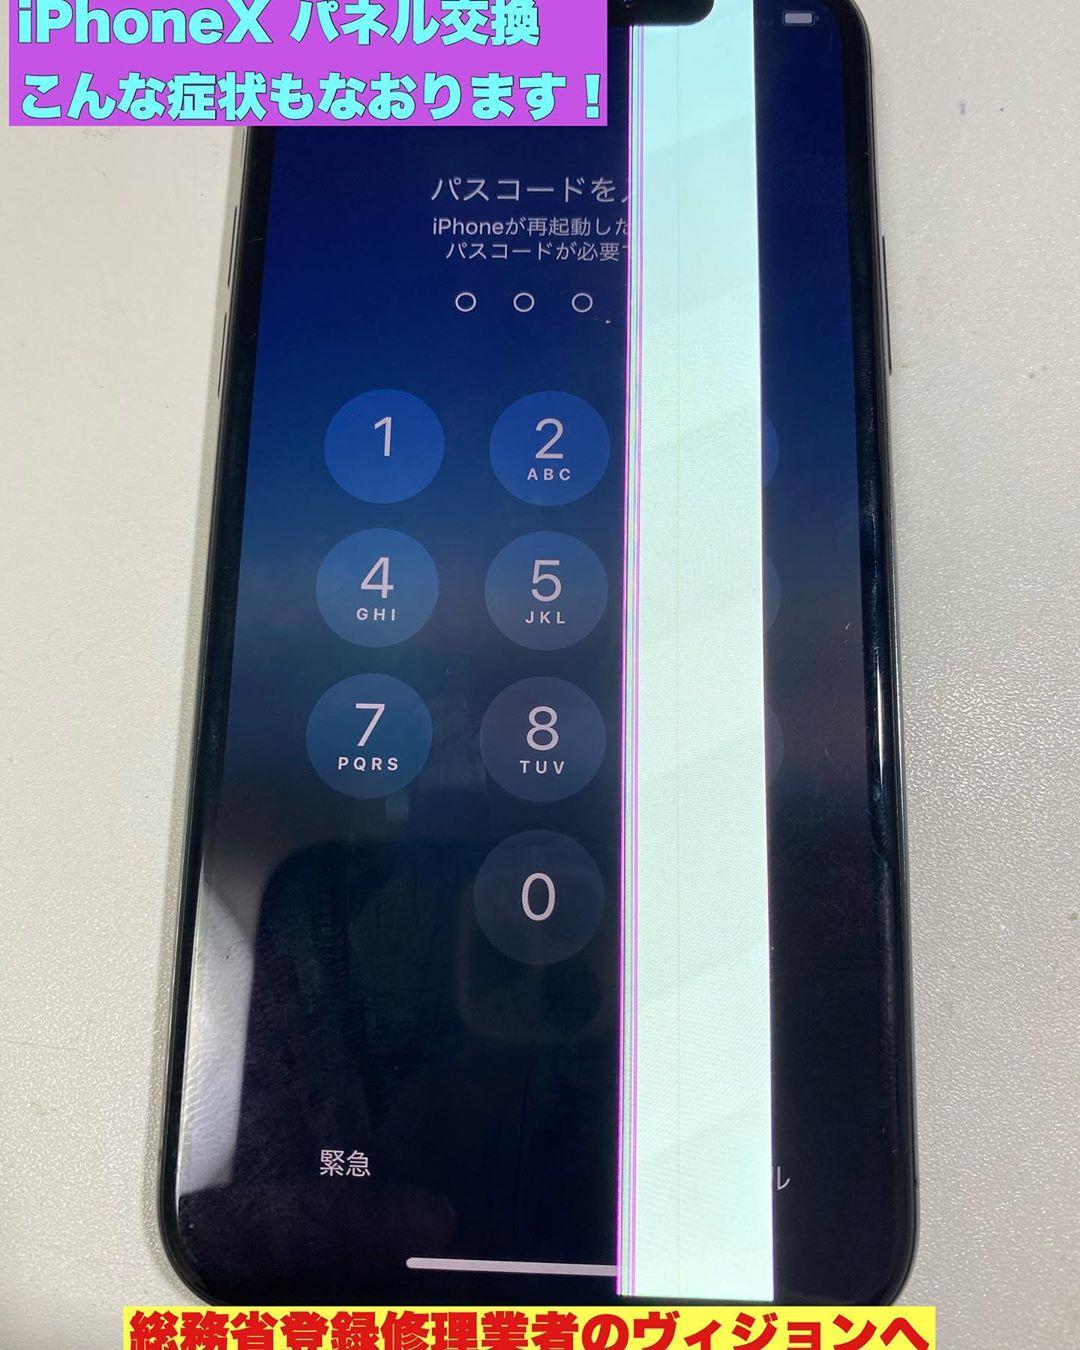 iPhoneテン 江南 犬山市 修理